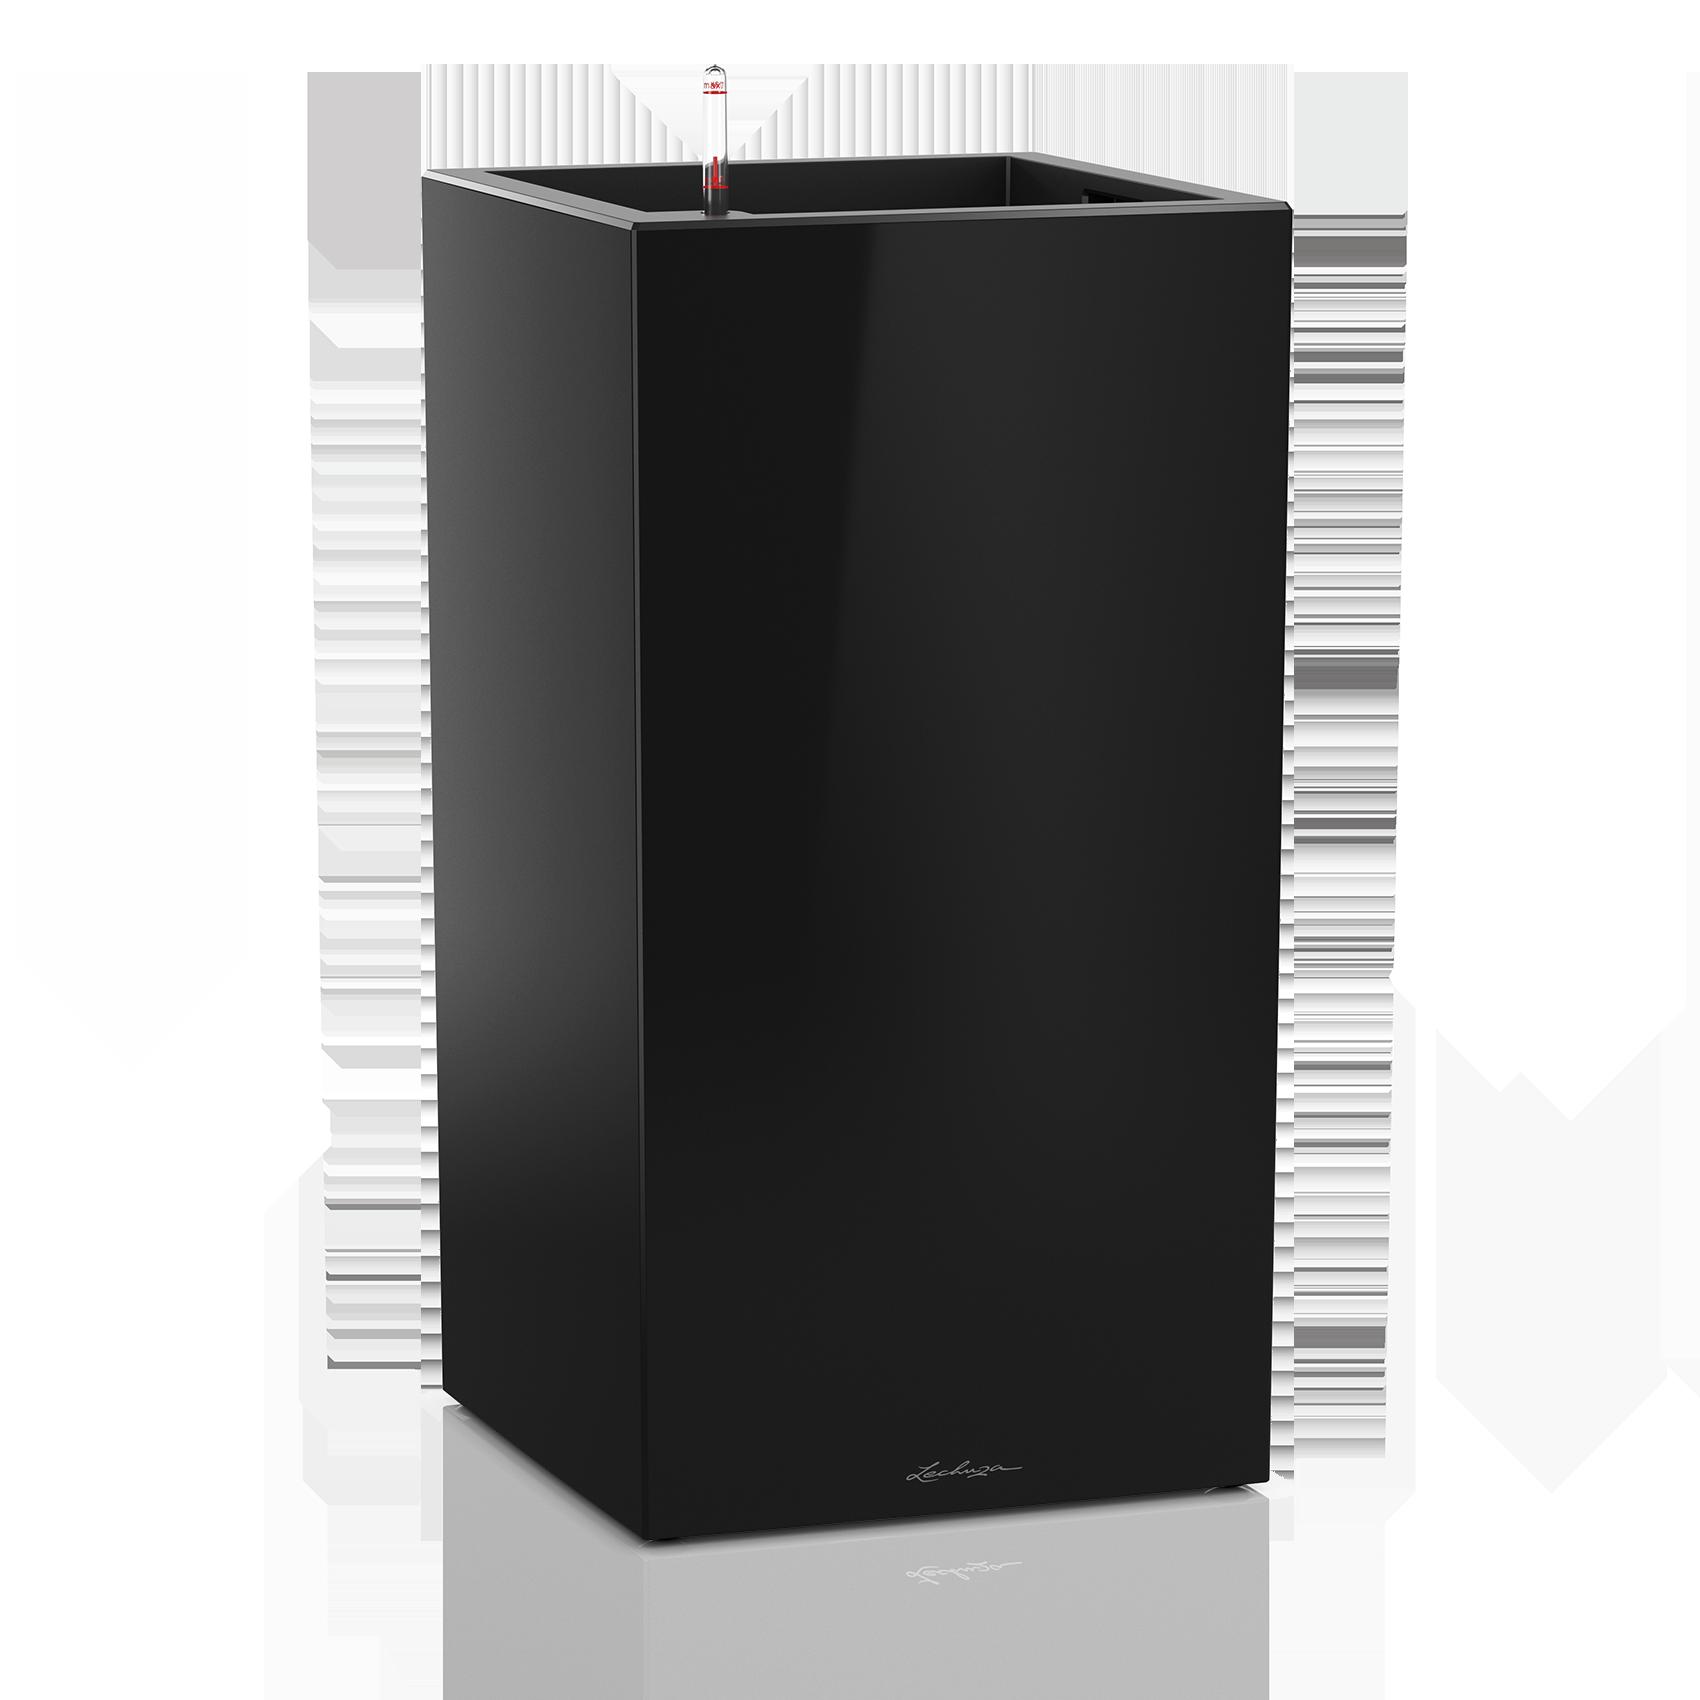 CANTO column 40 black high-gloss